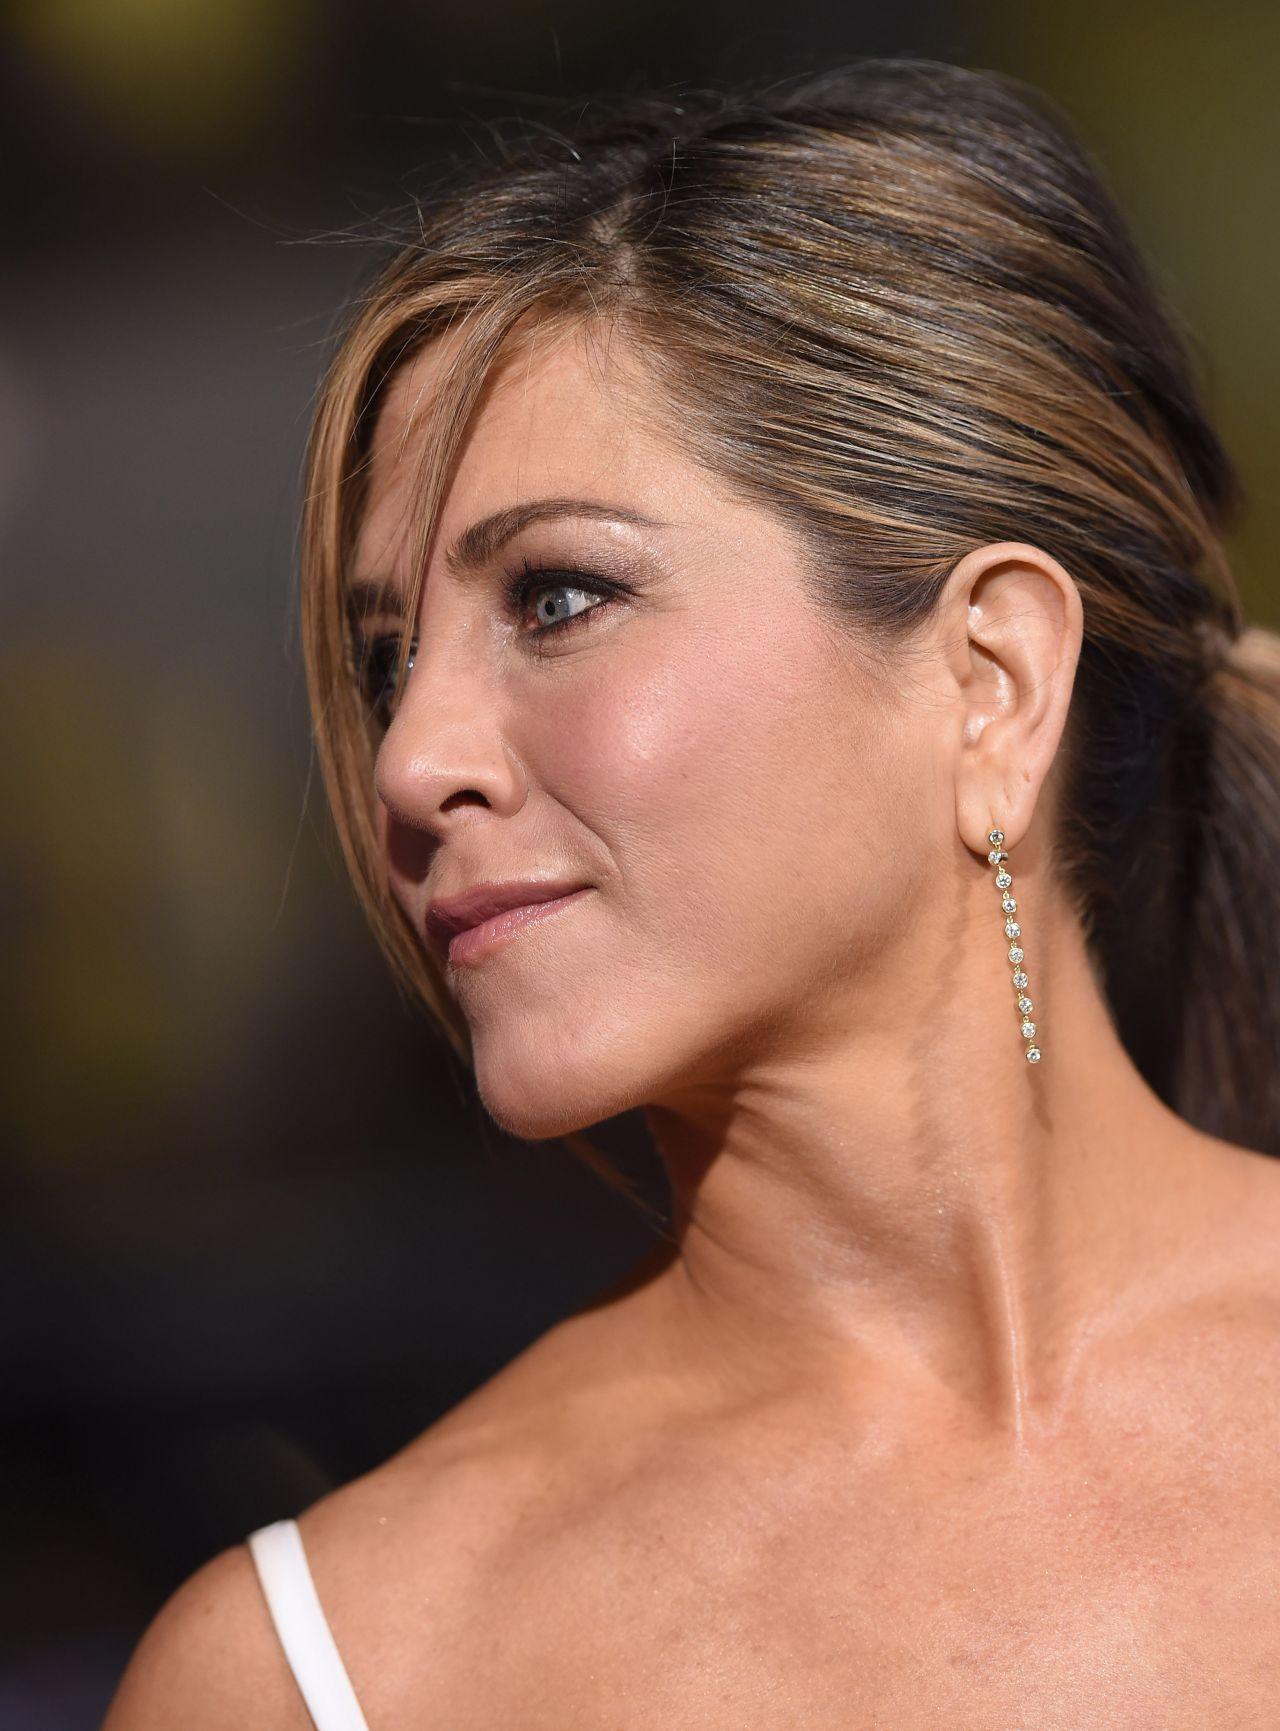 Jennifer Aniston Horrible Bosses 2 Premiere At Tcl